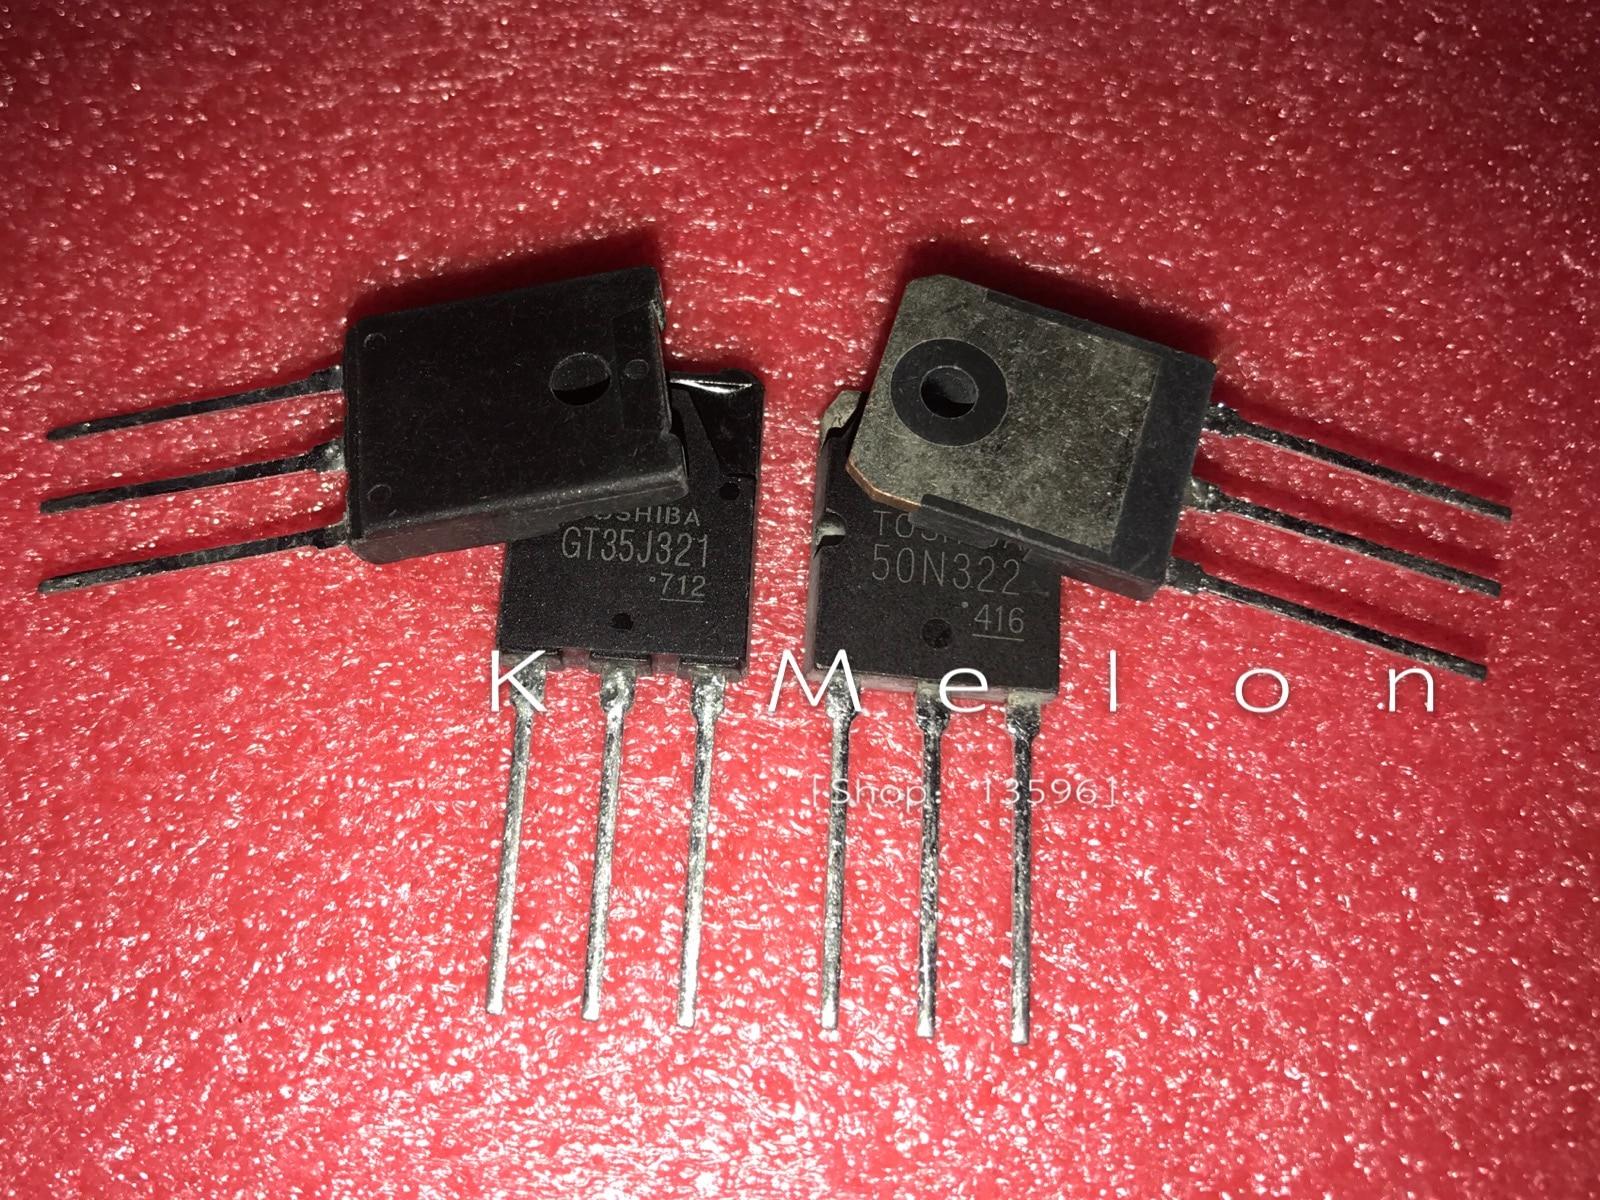 Nuevo GT35J321 35J321 TO-3PF + GT50N322 50N322 TO-3P